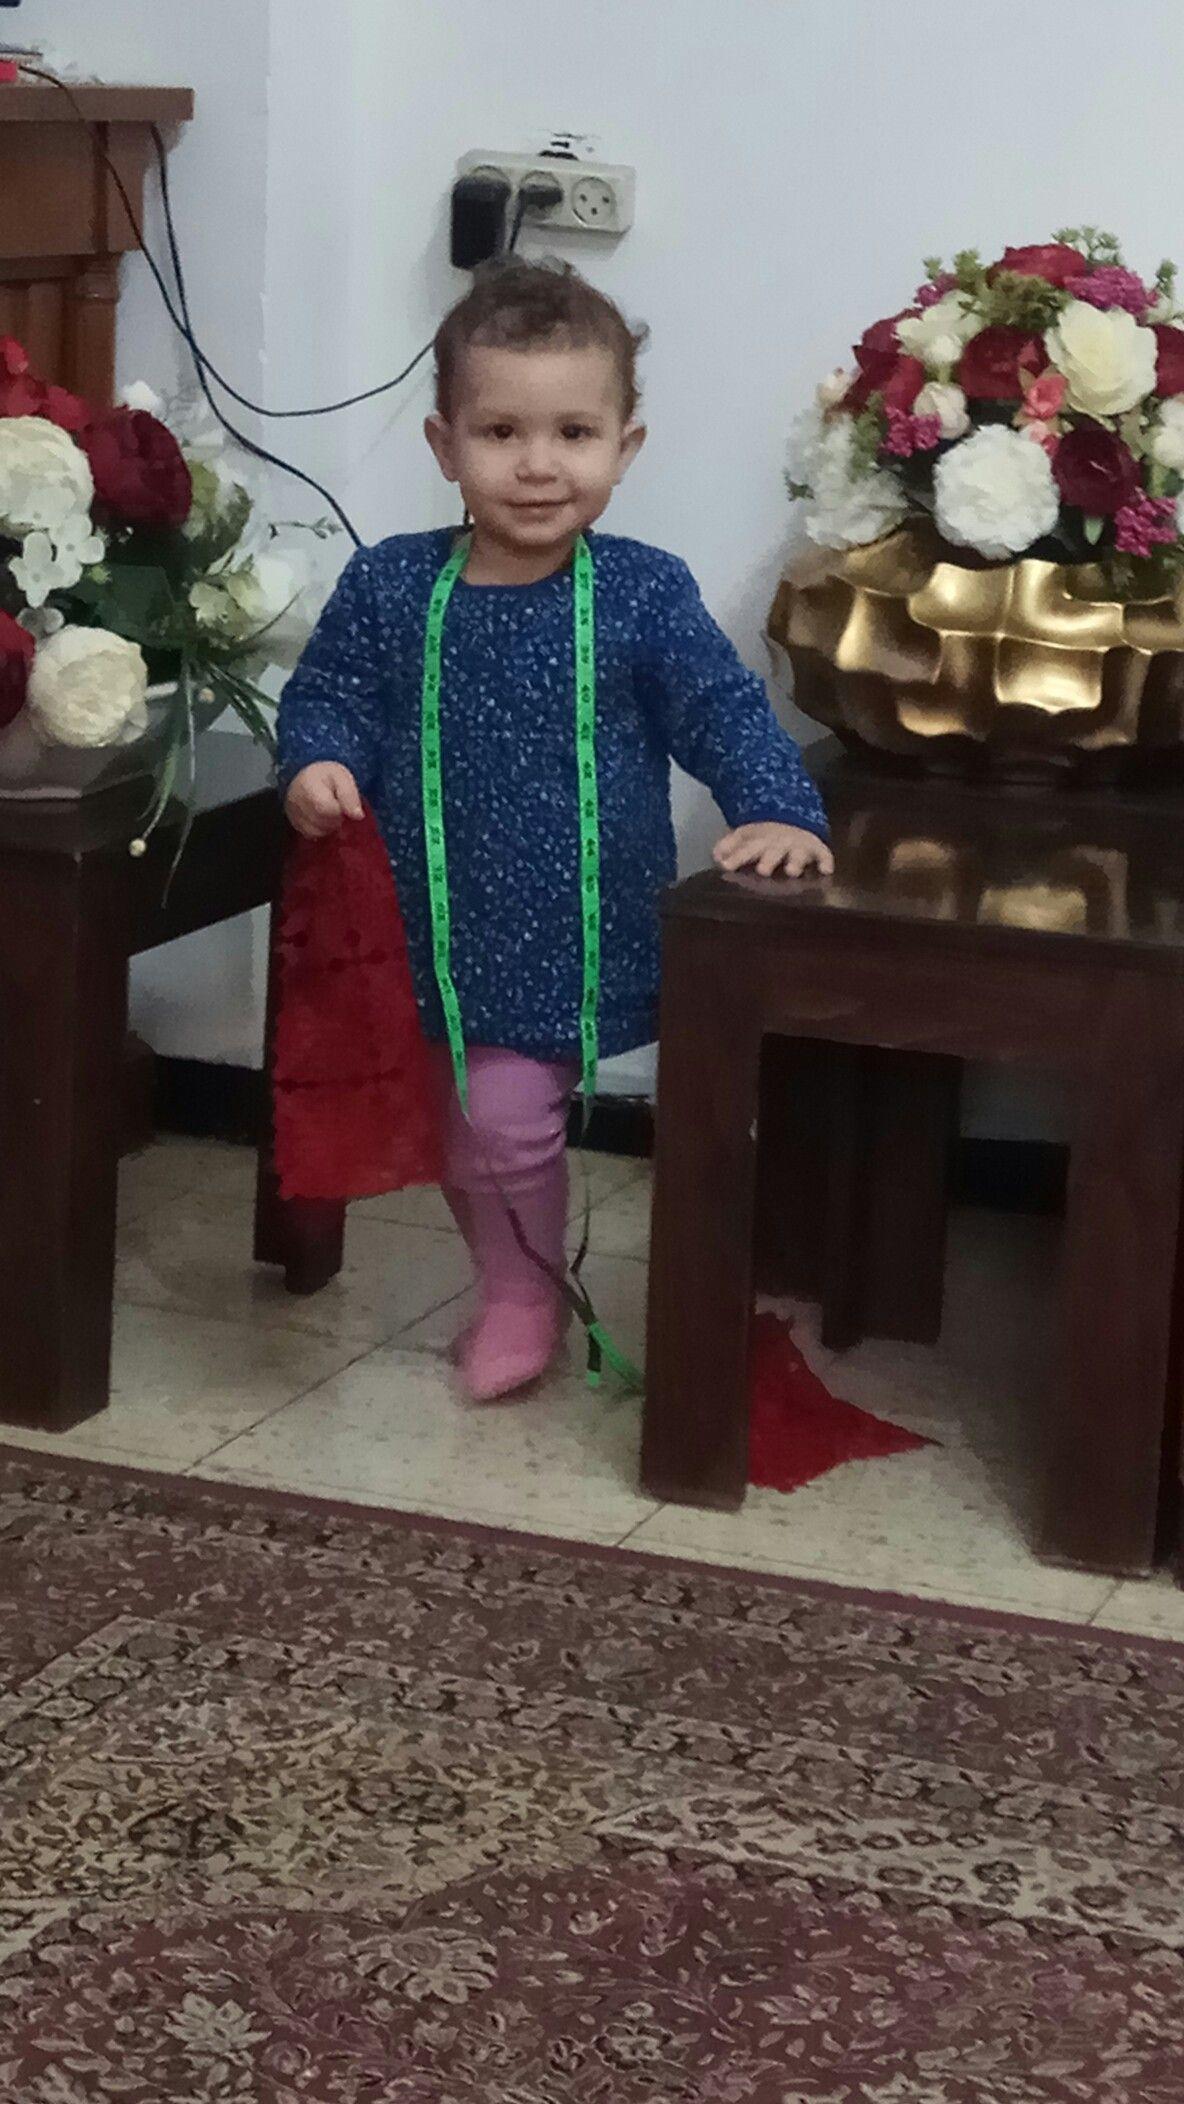 هاجر احمد عارف فرخ البط عوام Christmas Sweaters Sweaters Fashion